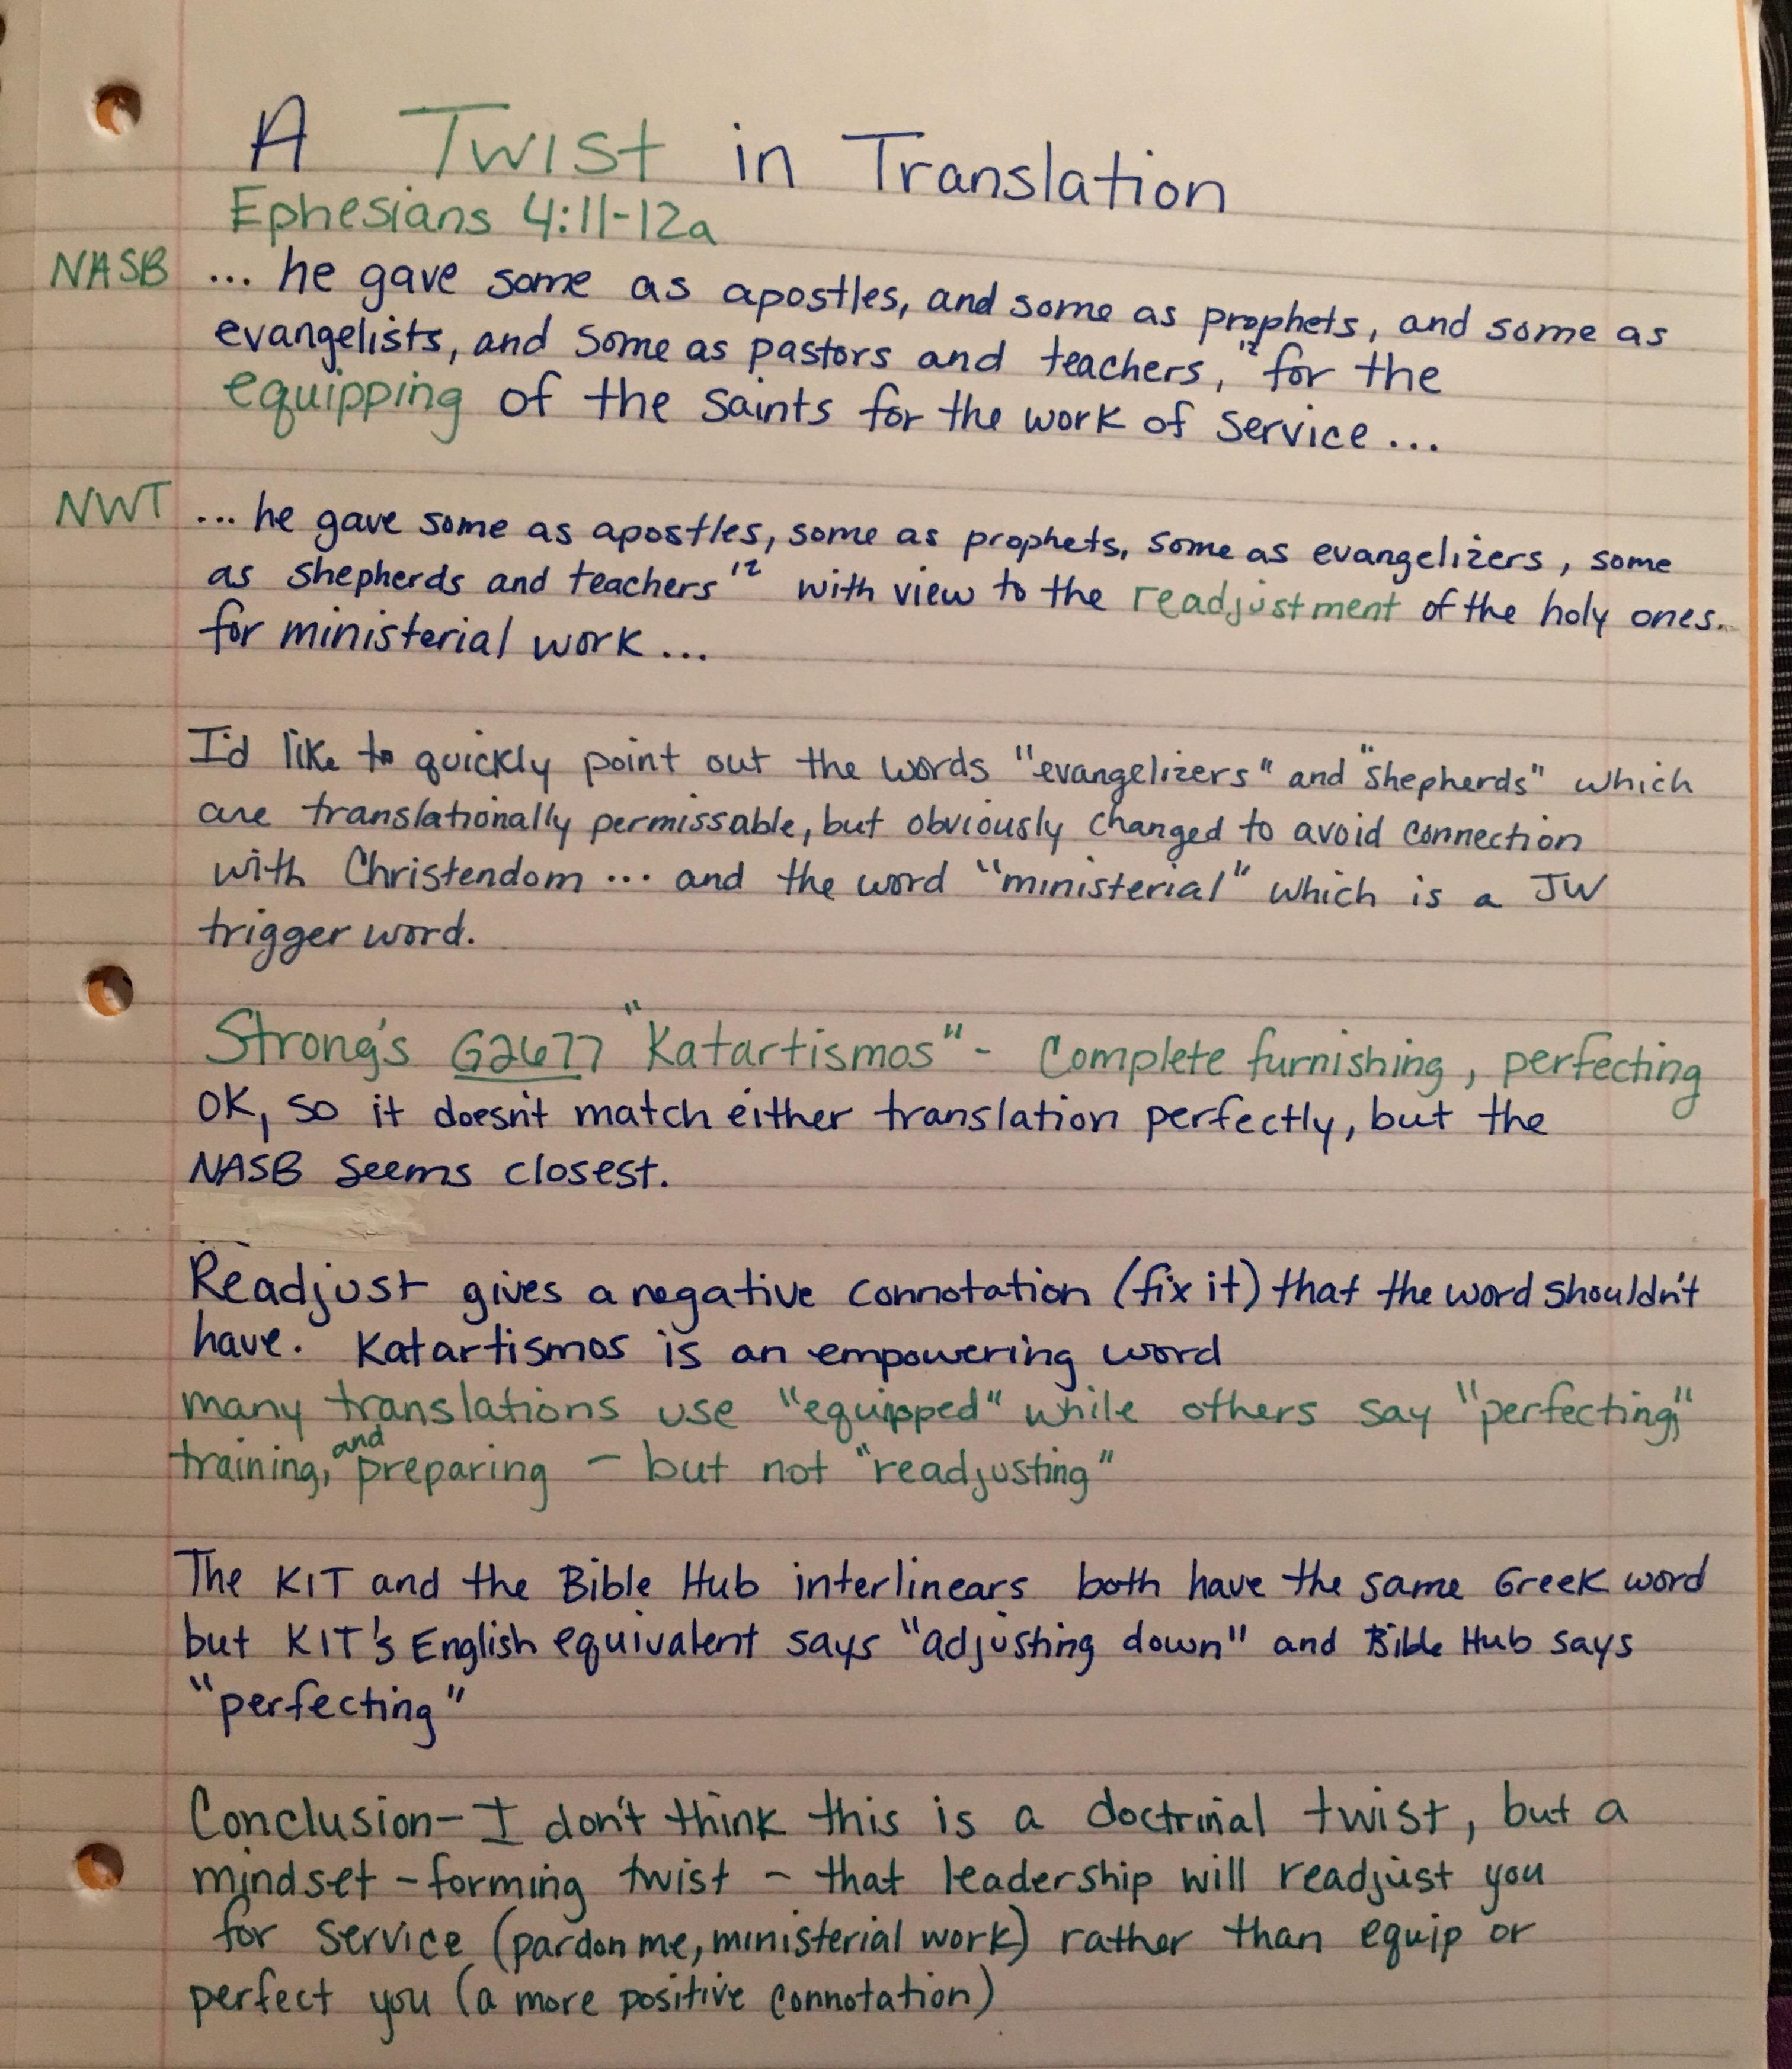 JWs Readjusted – A Twist in Translation